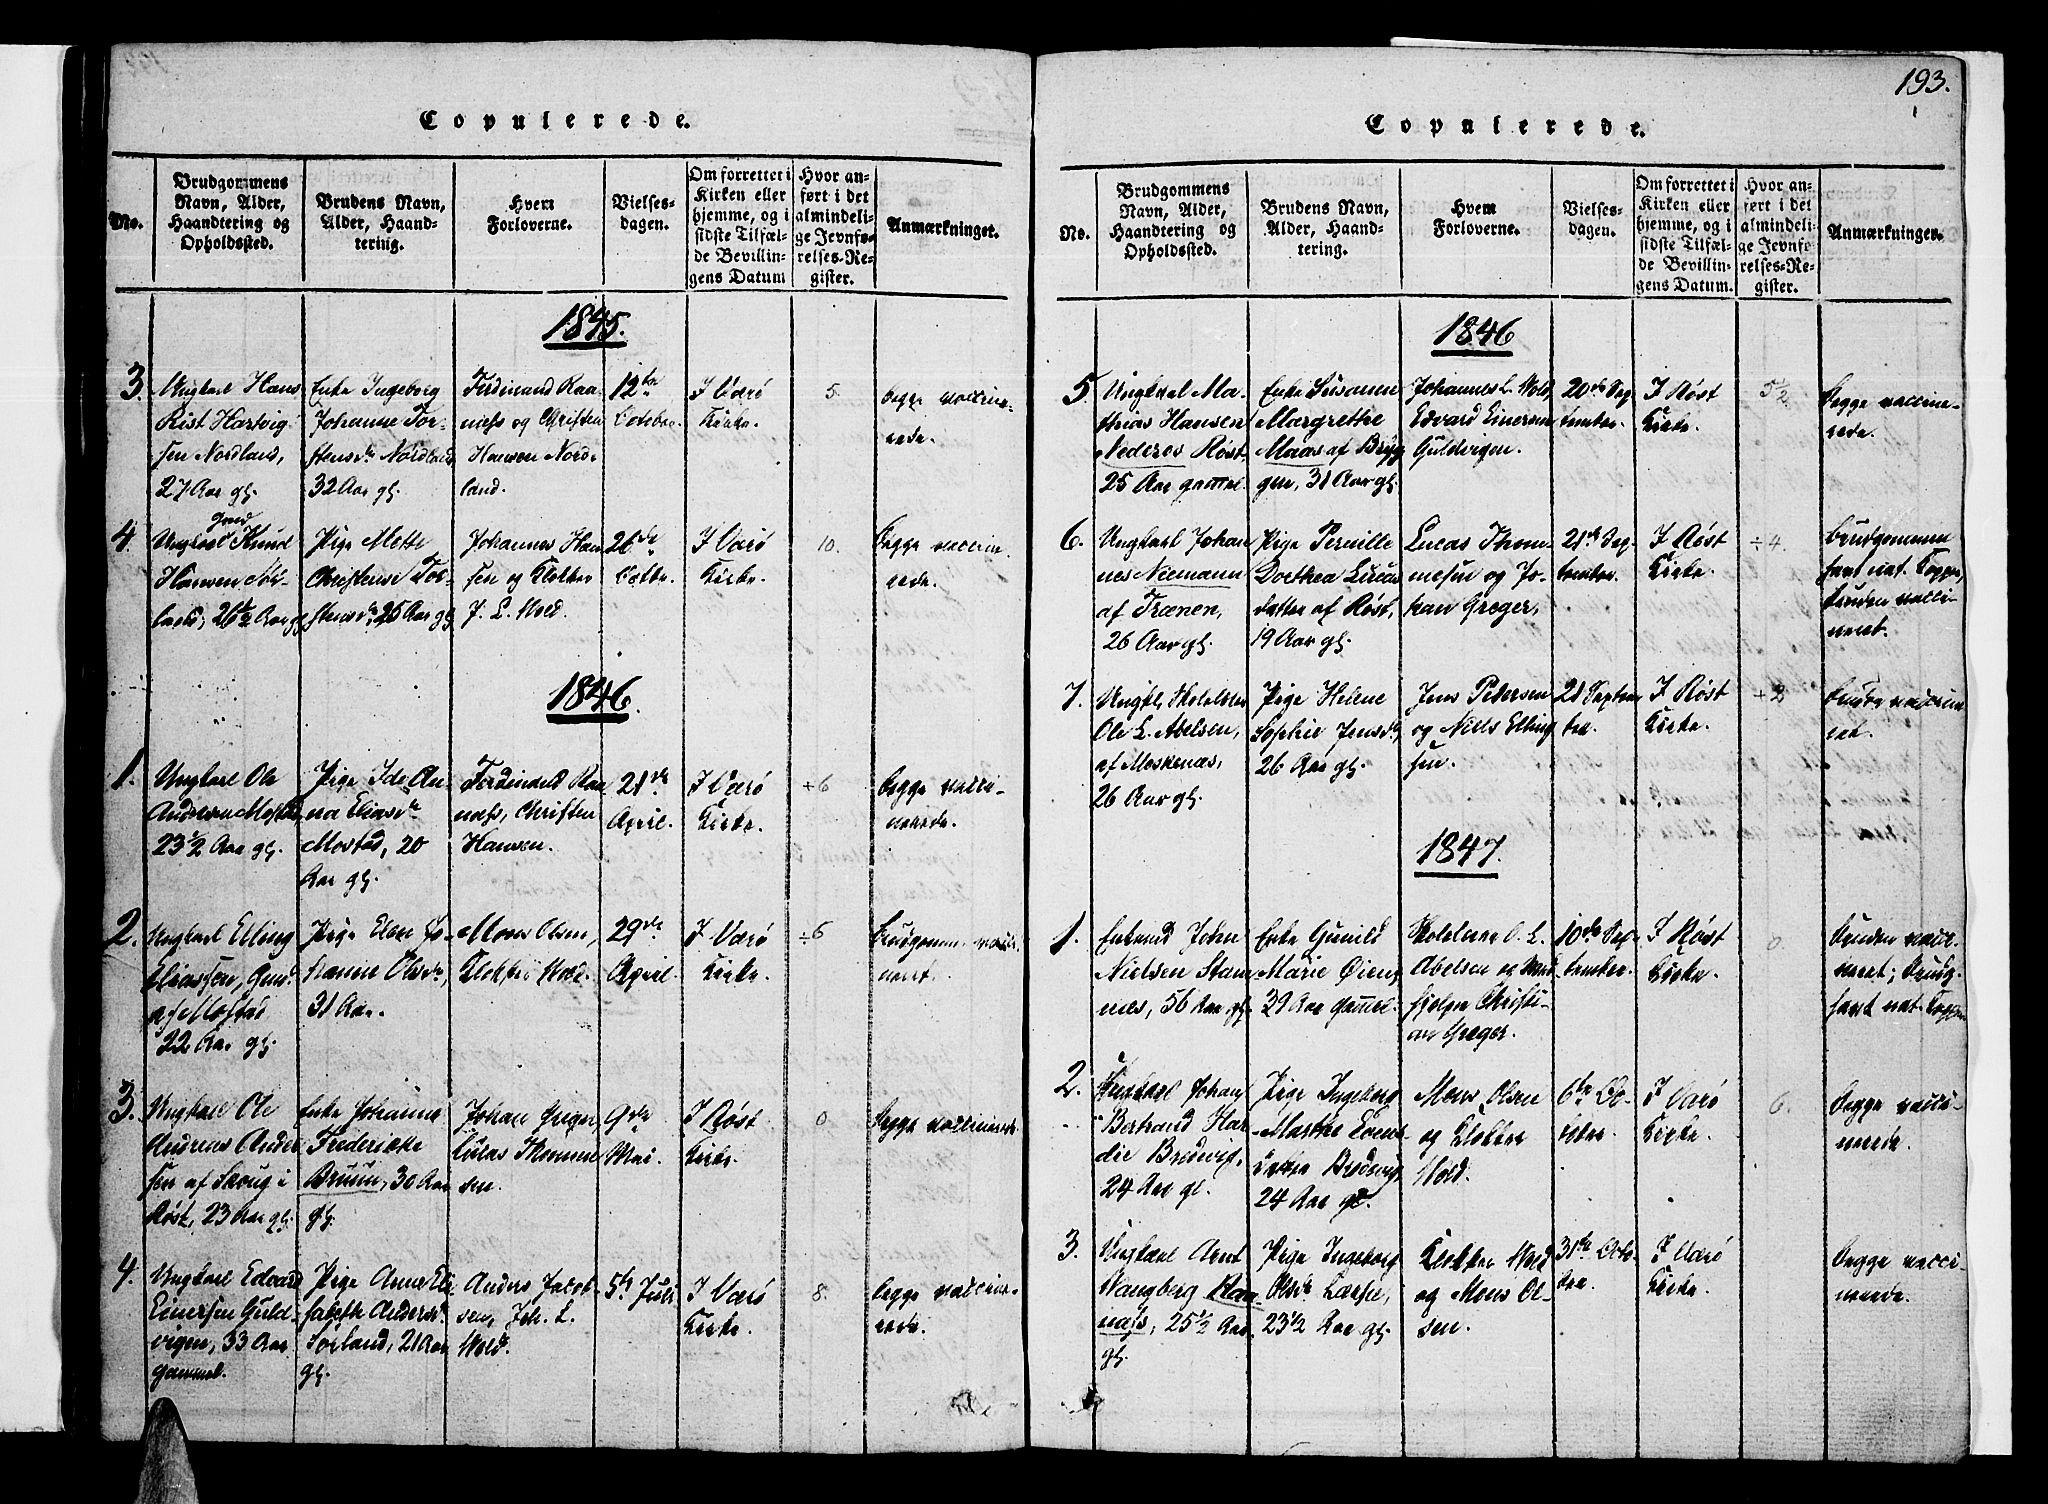 SAT, Ministerialprotokoller, klokkerbøker og fødselsregistre - Nordland, 807/L0120: Ministerialbok nr. 807A03, 1821-1848, s. 193